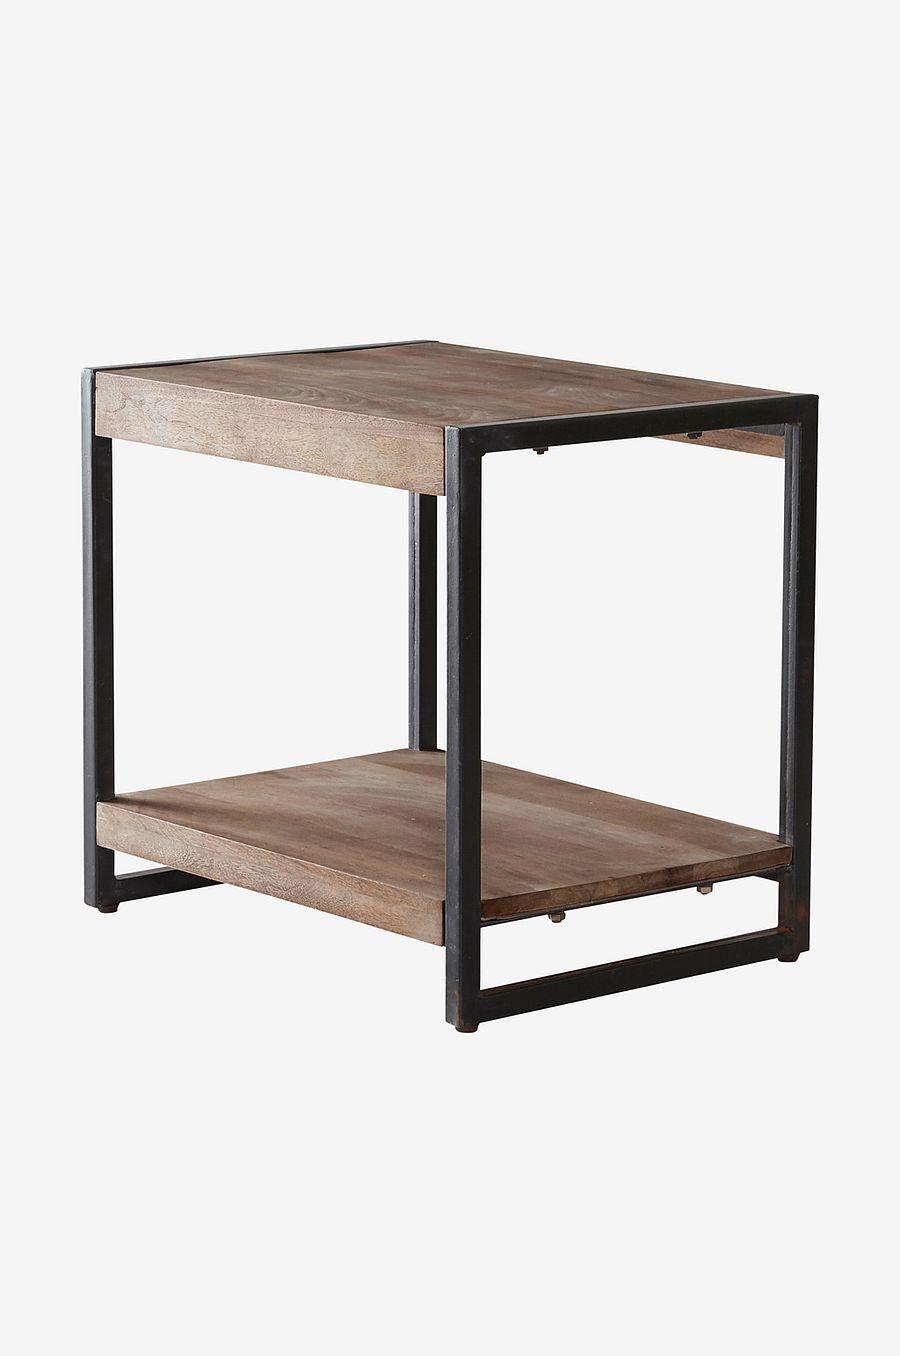 Enorm Sveg SVEG avlastningsbord - Svart - Møbler - Jotex.no MX-68